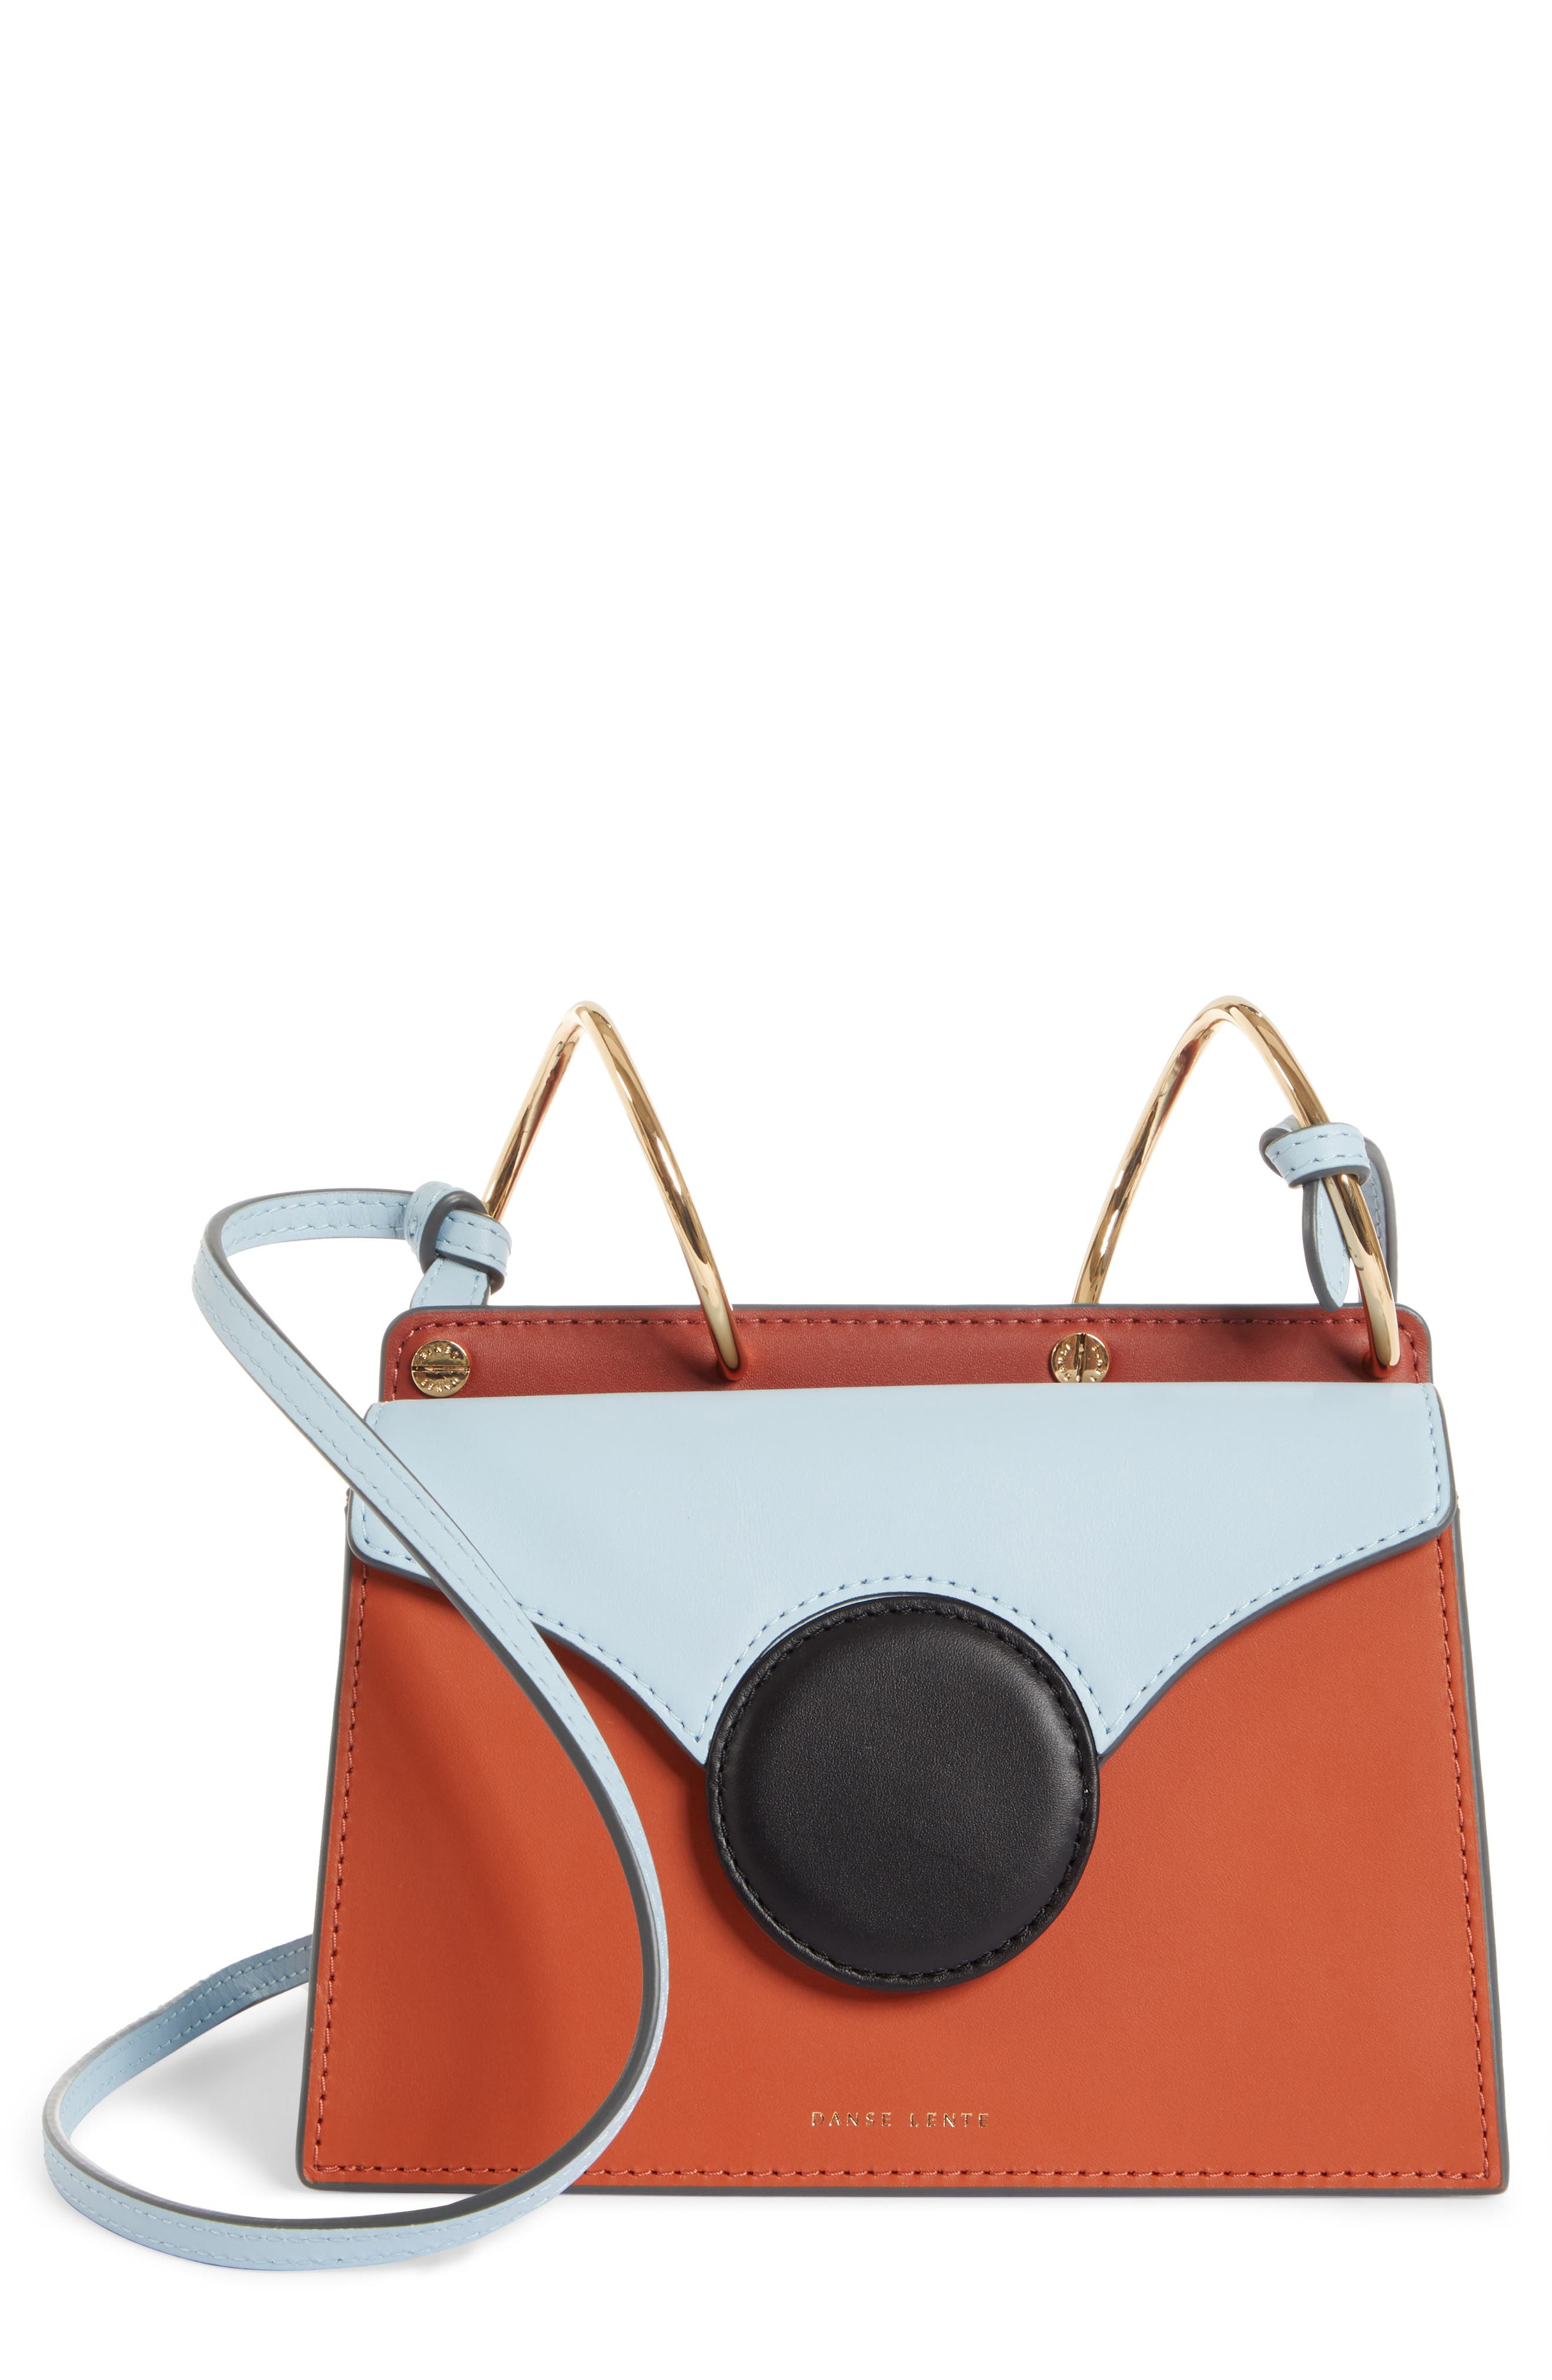 a41b5a8a8d3e Danse Lente Handbags   Wallets for Women